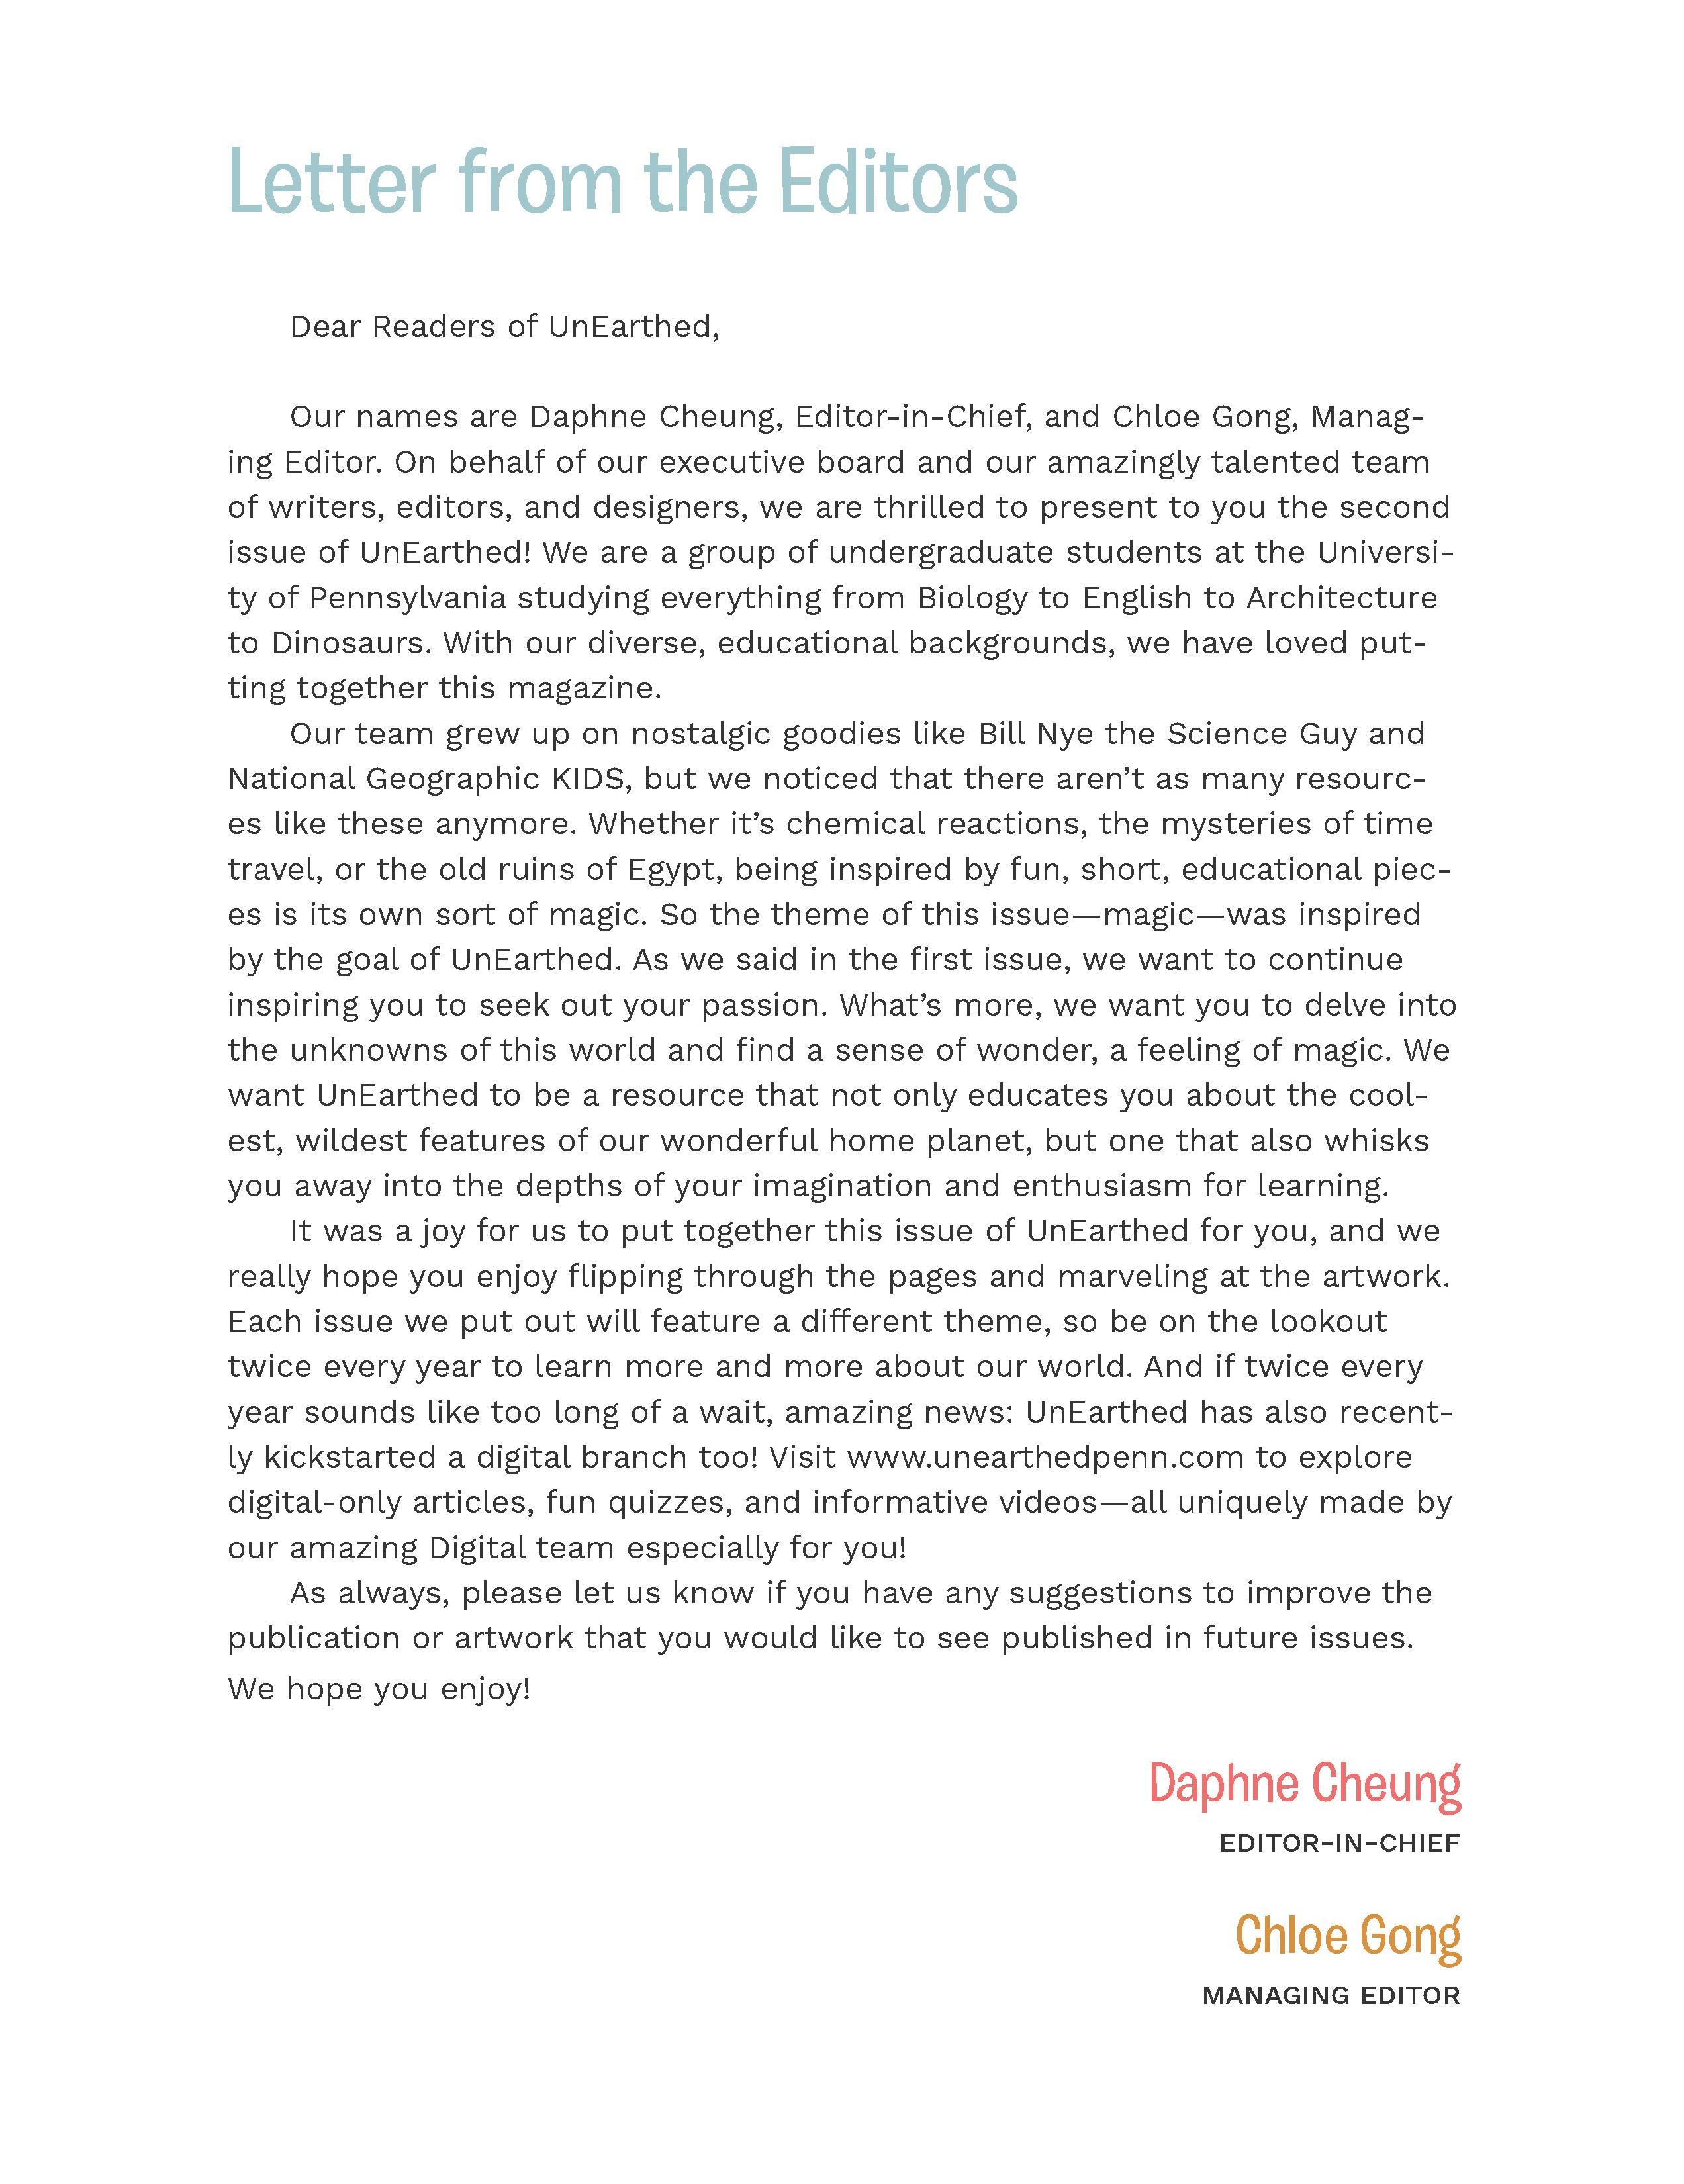 Editors' Letter